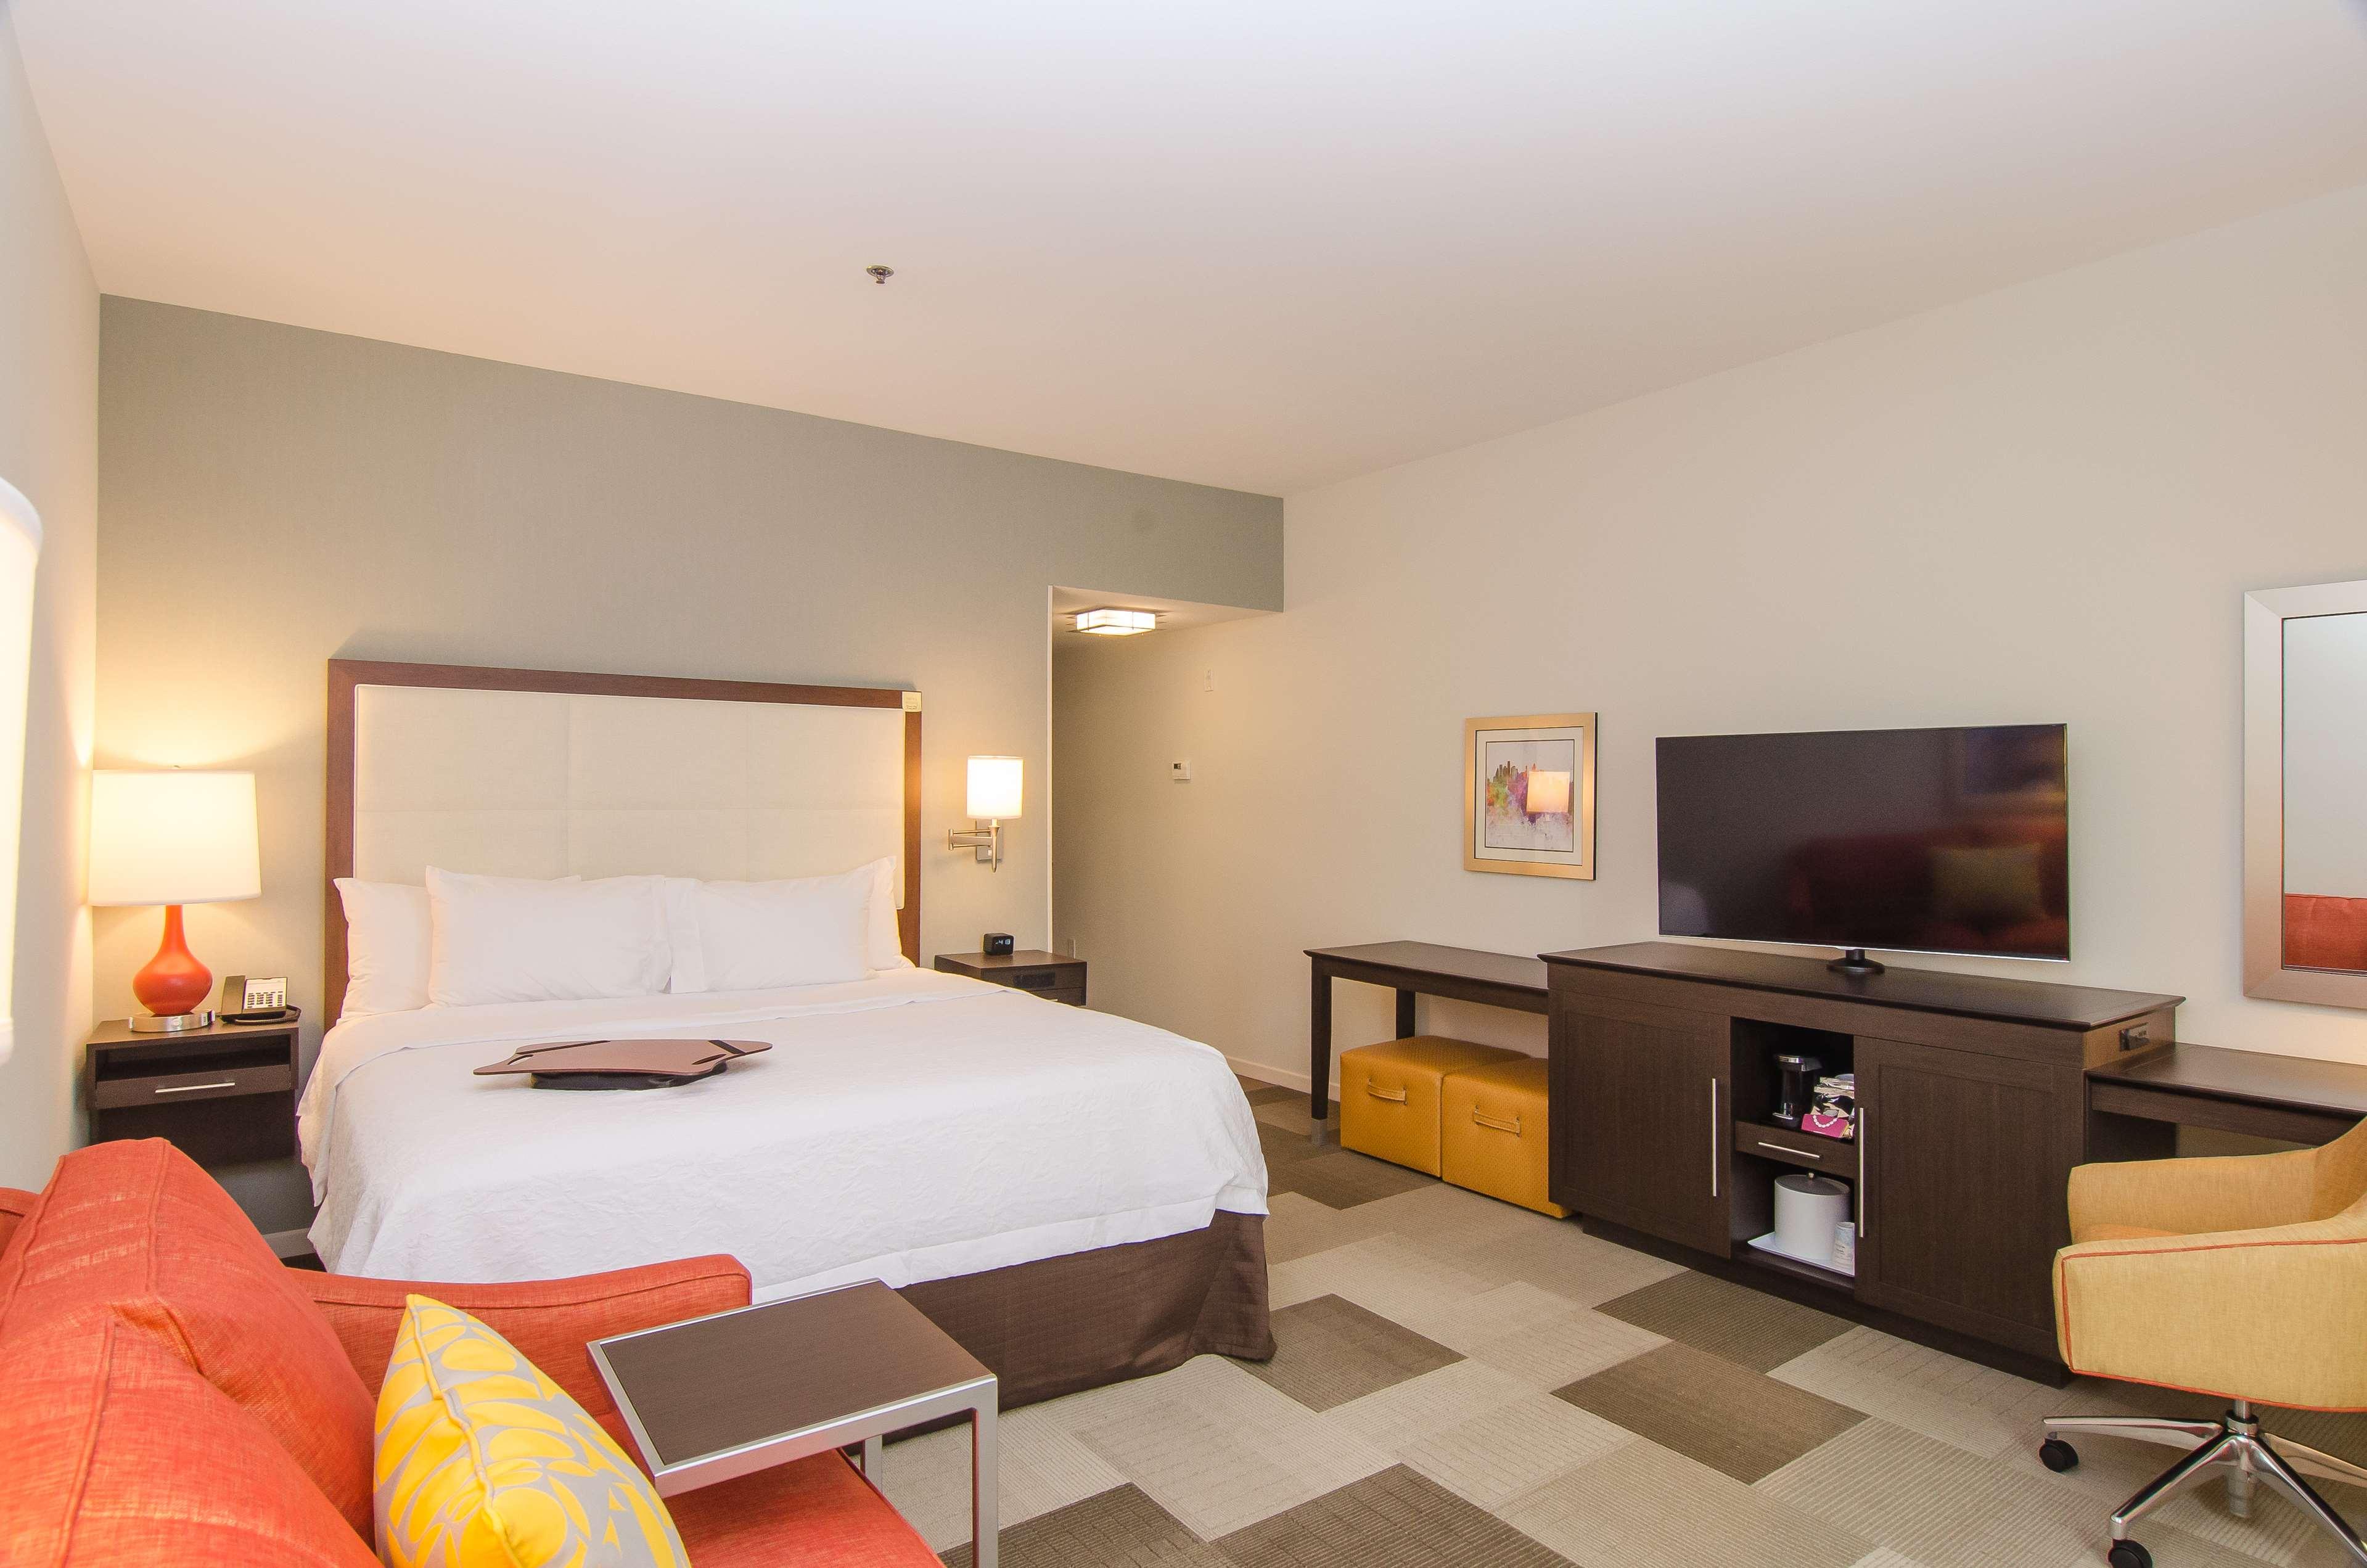 Hampton Inn & Suites Houston North IAH image 20